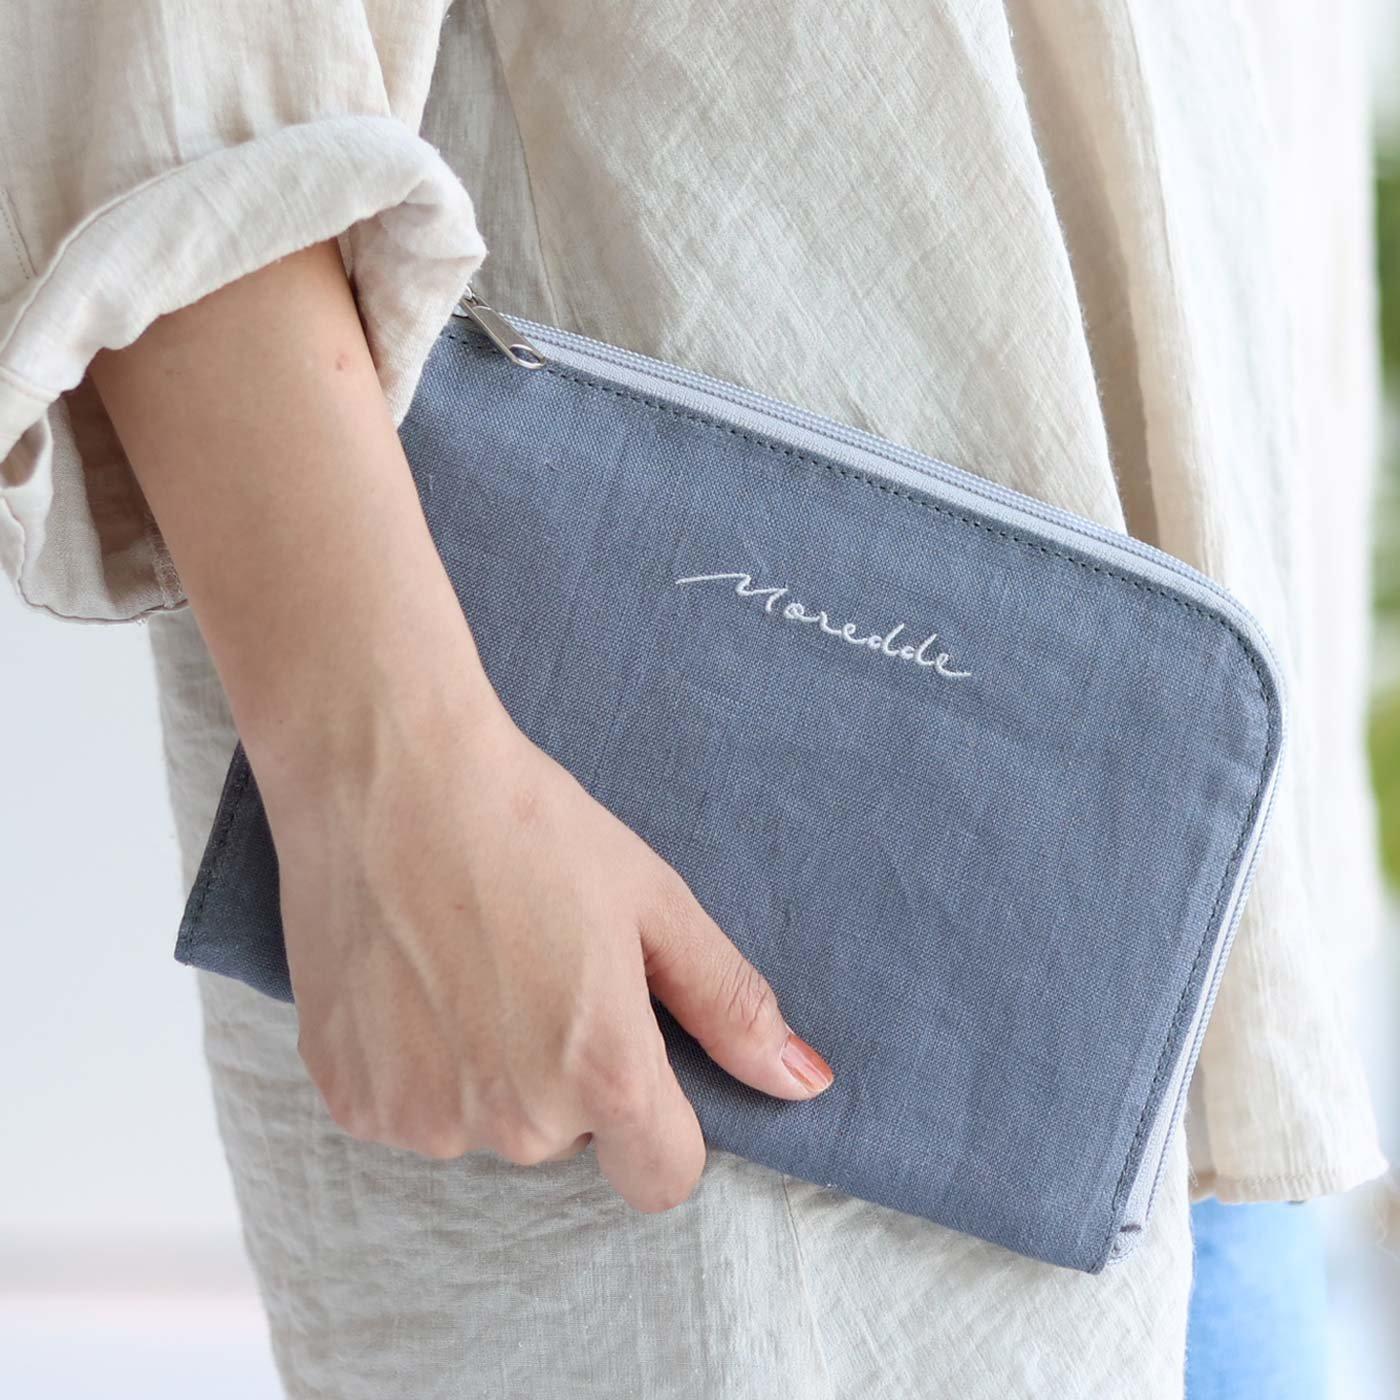 Moredde ジャバラポケットで仕分け上手 軽くてスリムな母子手帳ケース〈ブルー〉